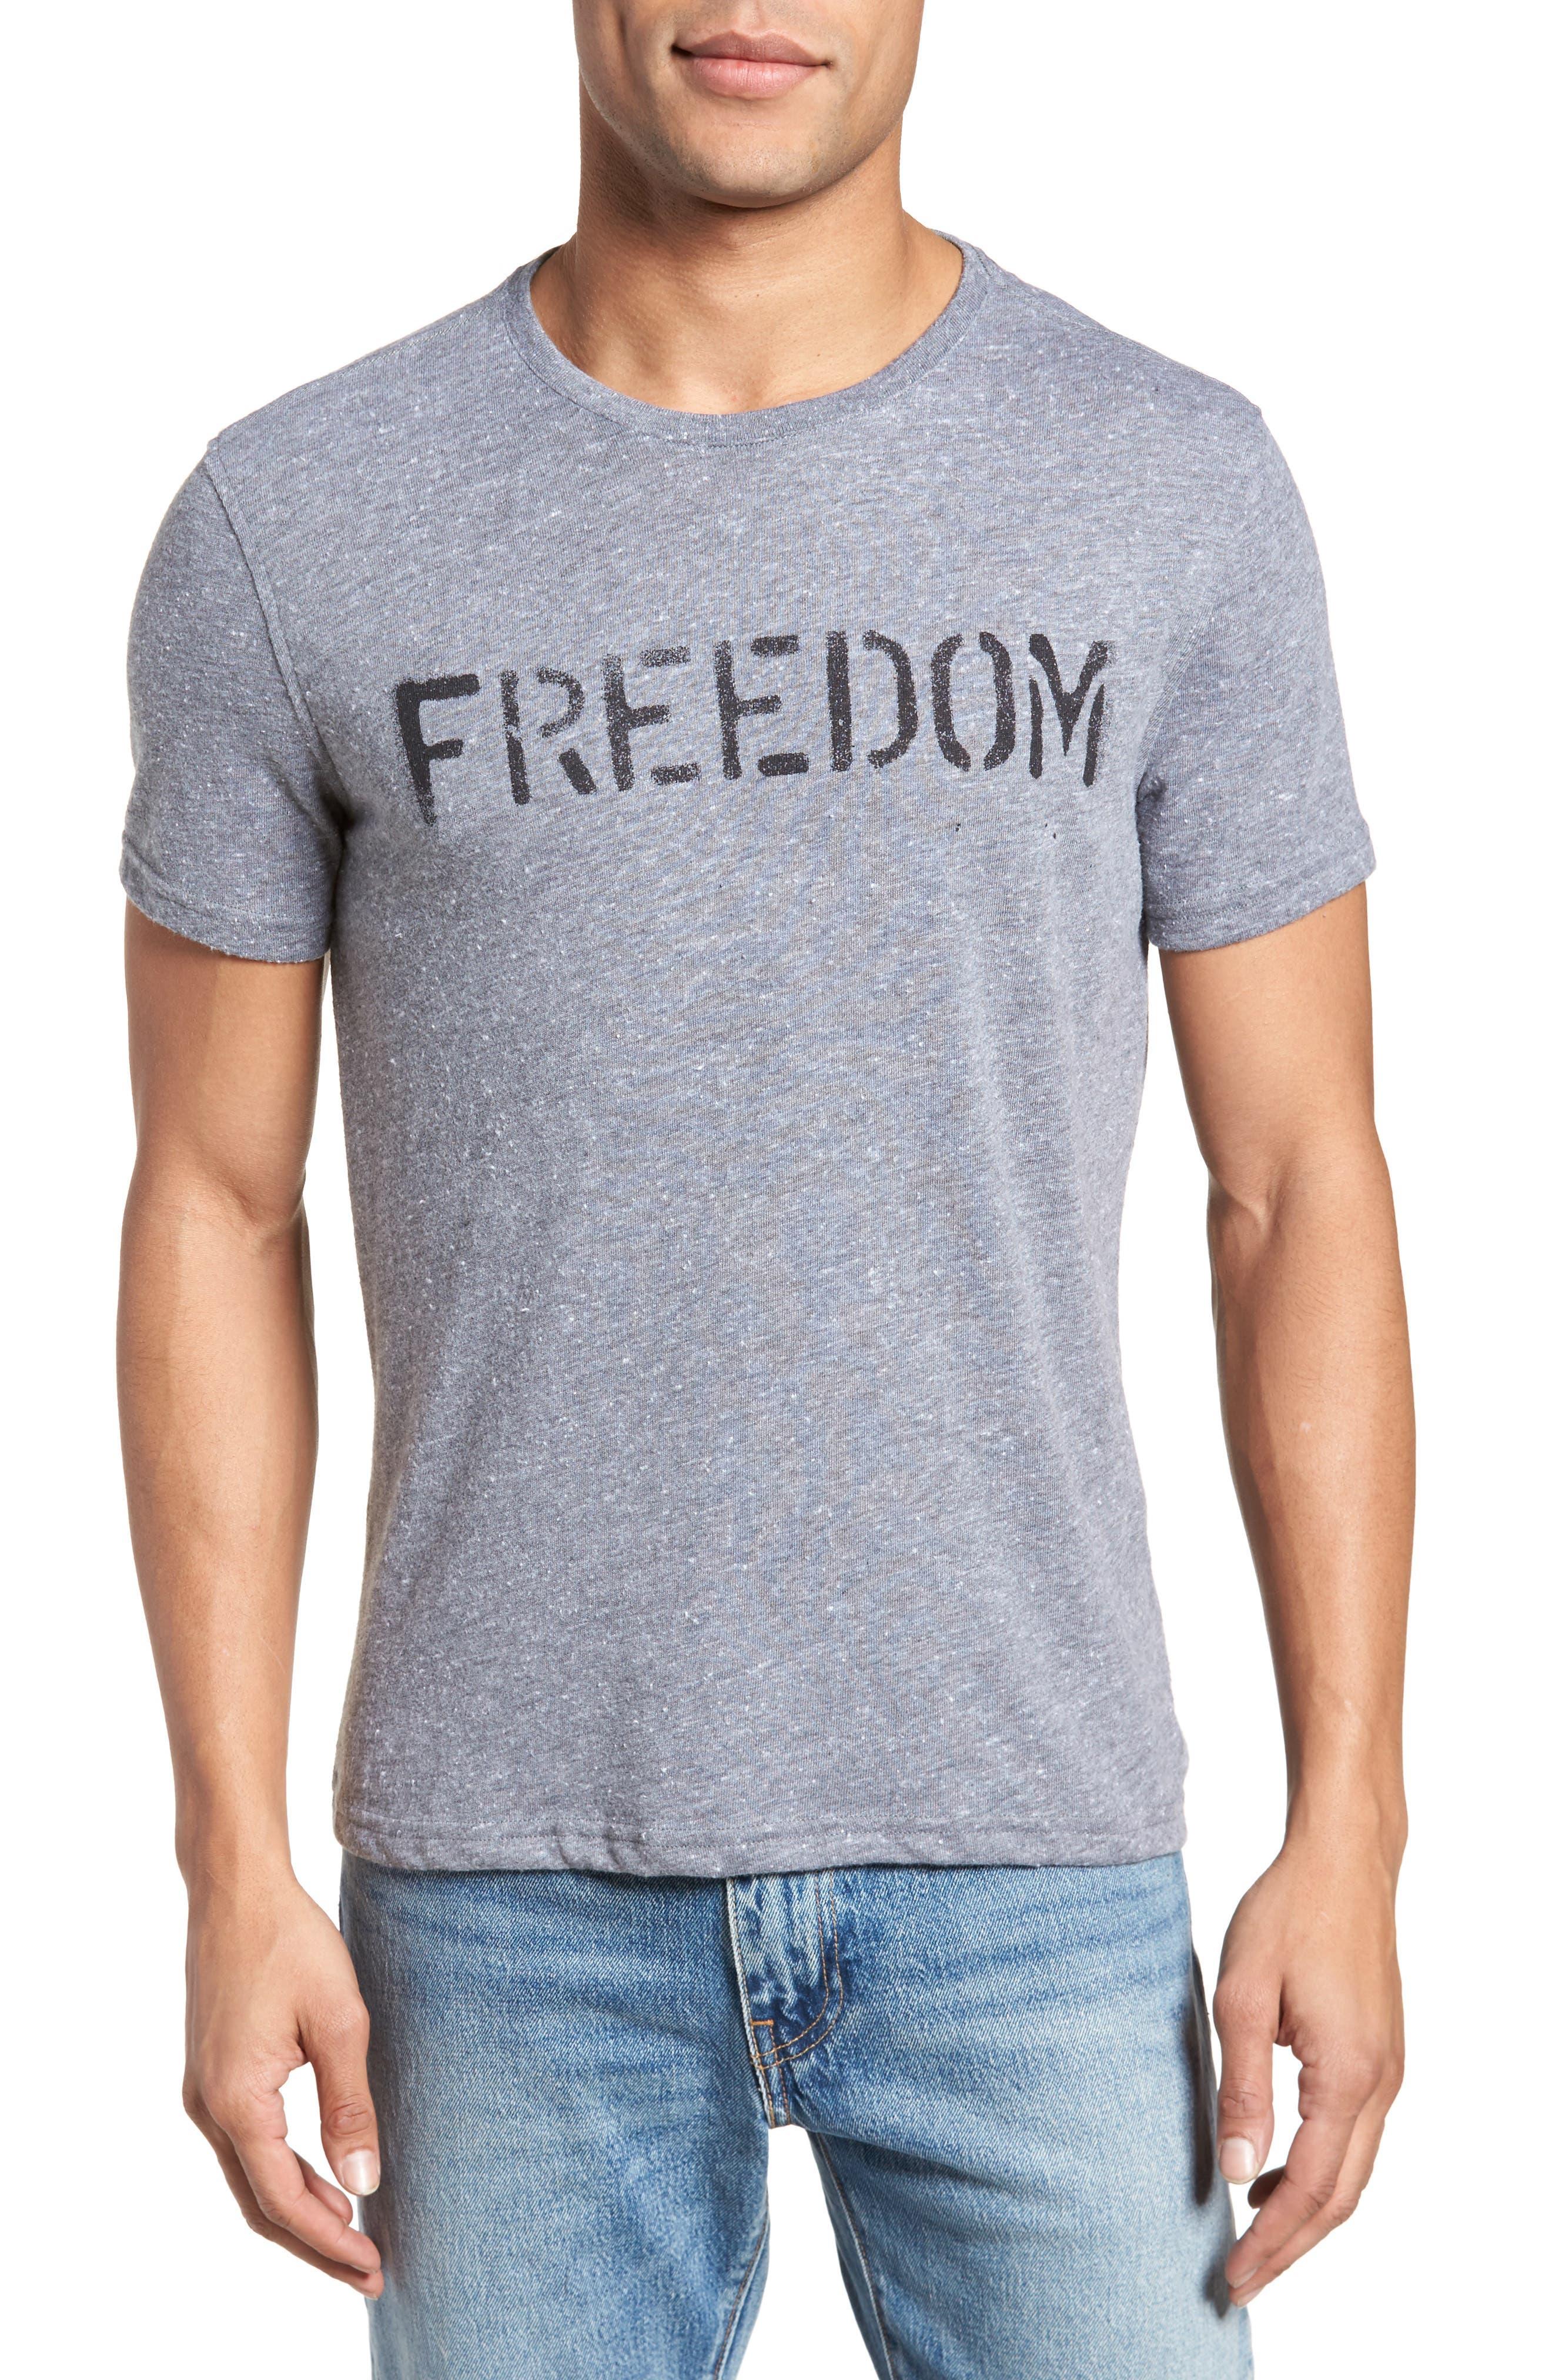 Freedom Graphic T-Shirt,                             Main thumbnail 1, color,                             Hematite